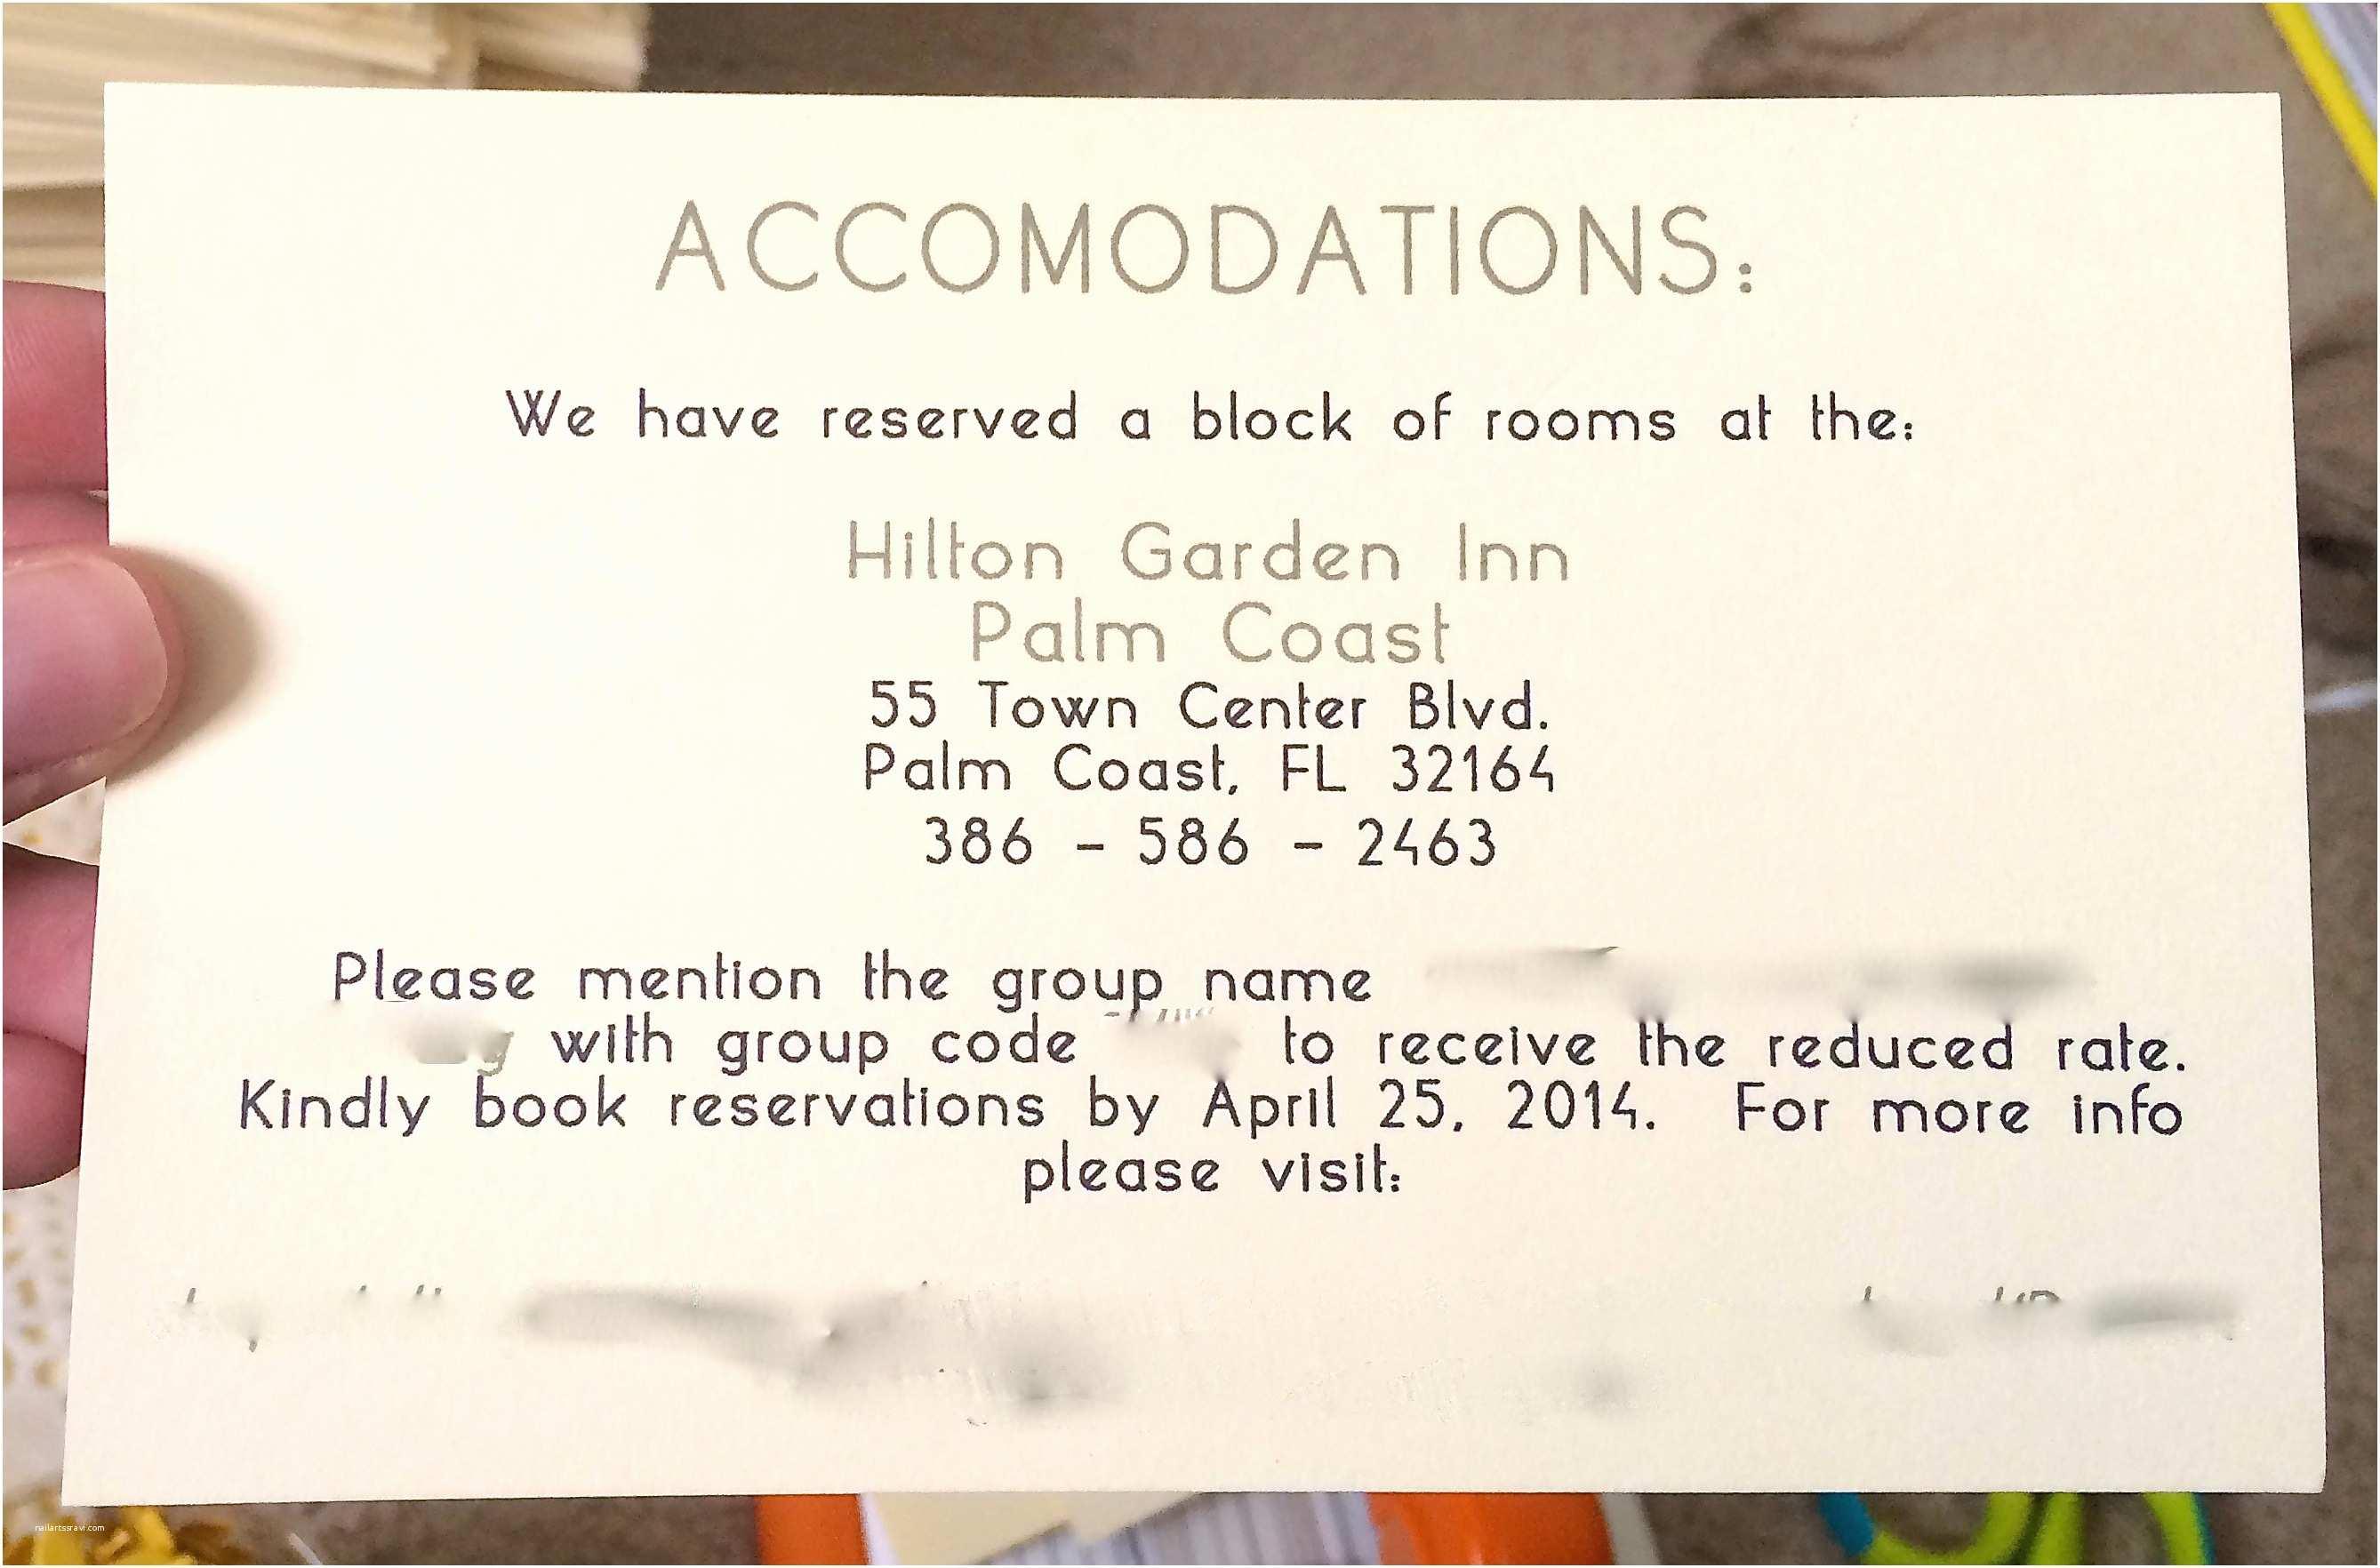 Wedding Invitations Hotel Accommodation Cards Wedding Invitation Wording Hotel Ac Modations Fresh